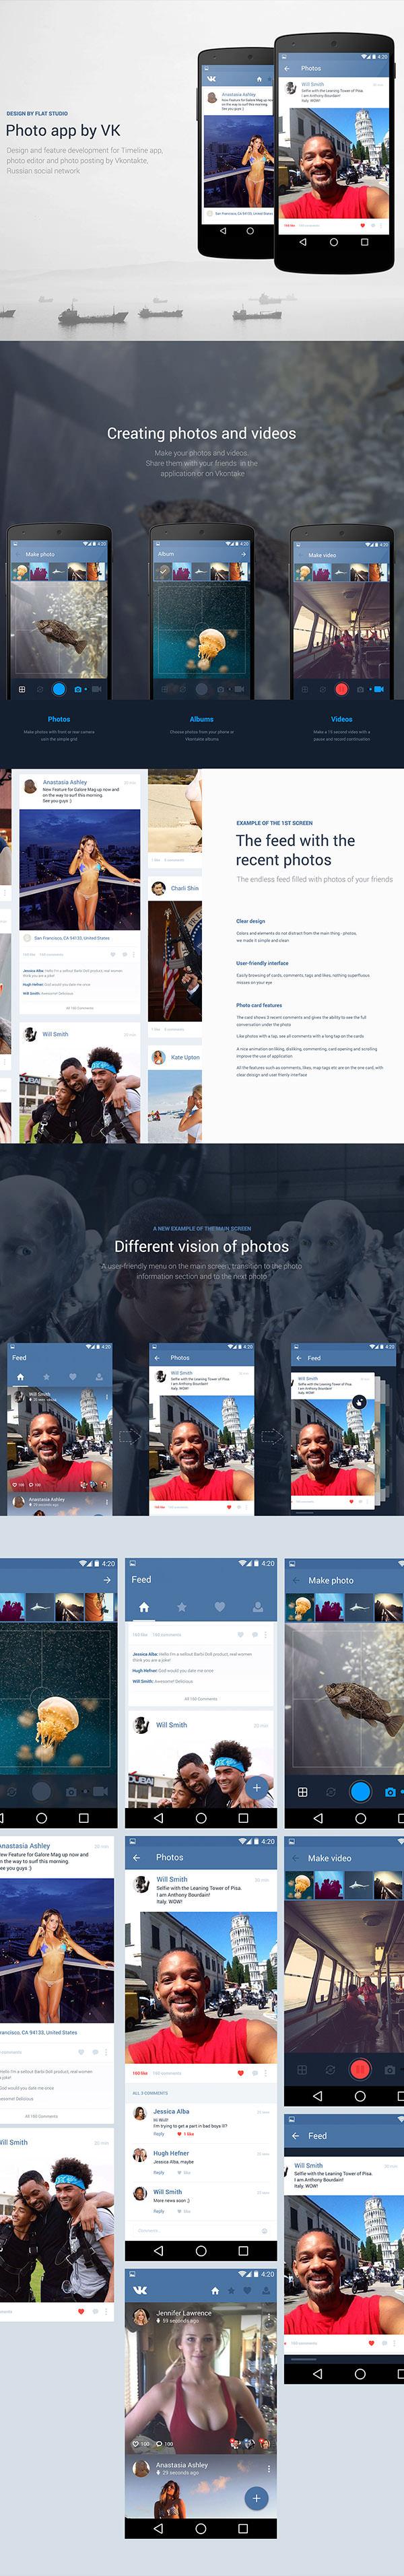 vk photo app design concept